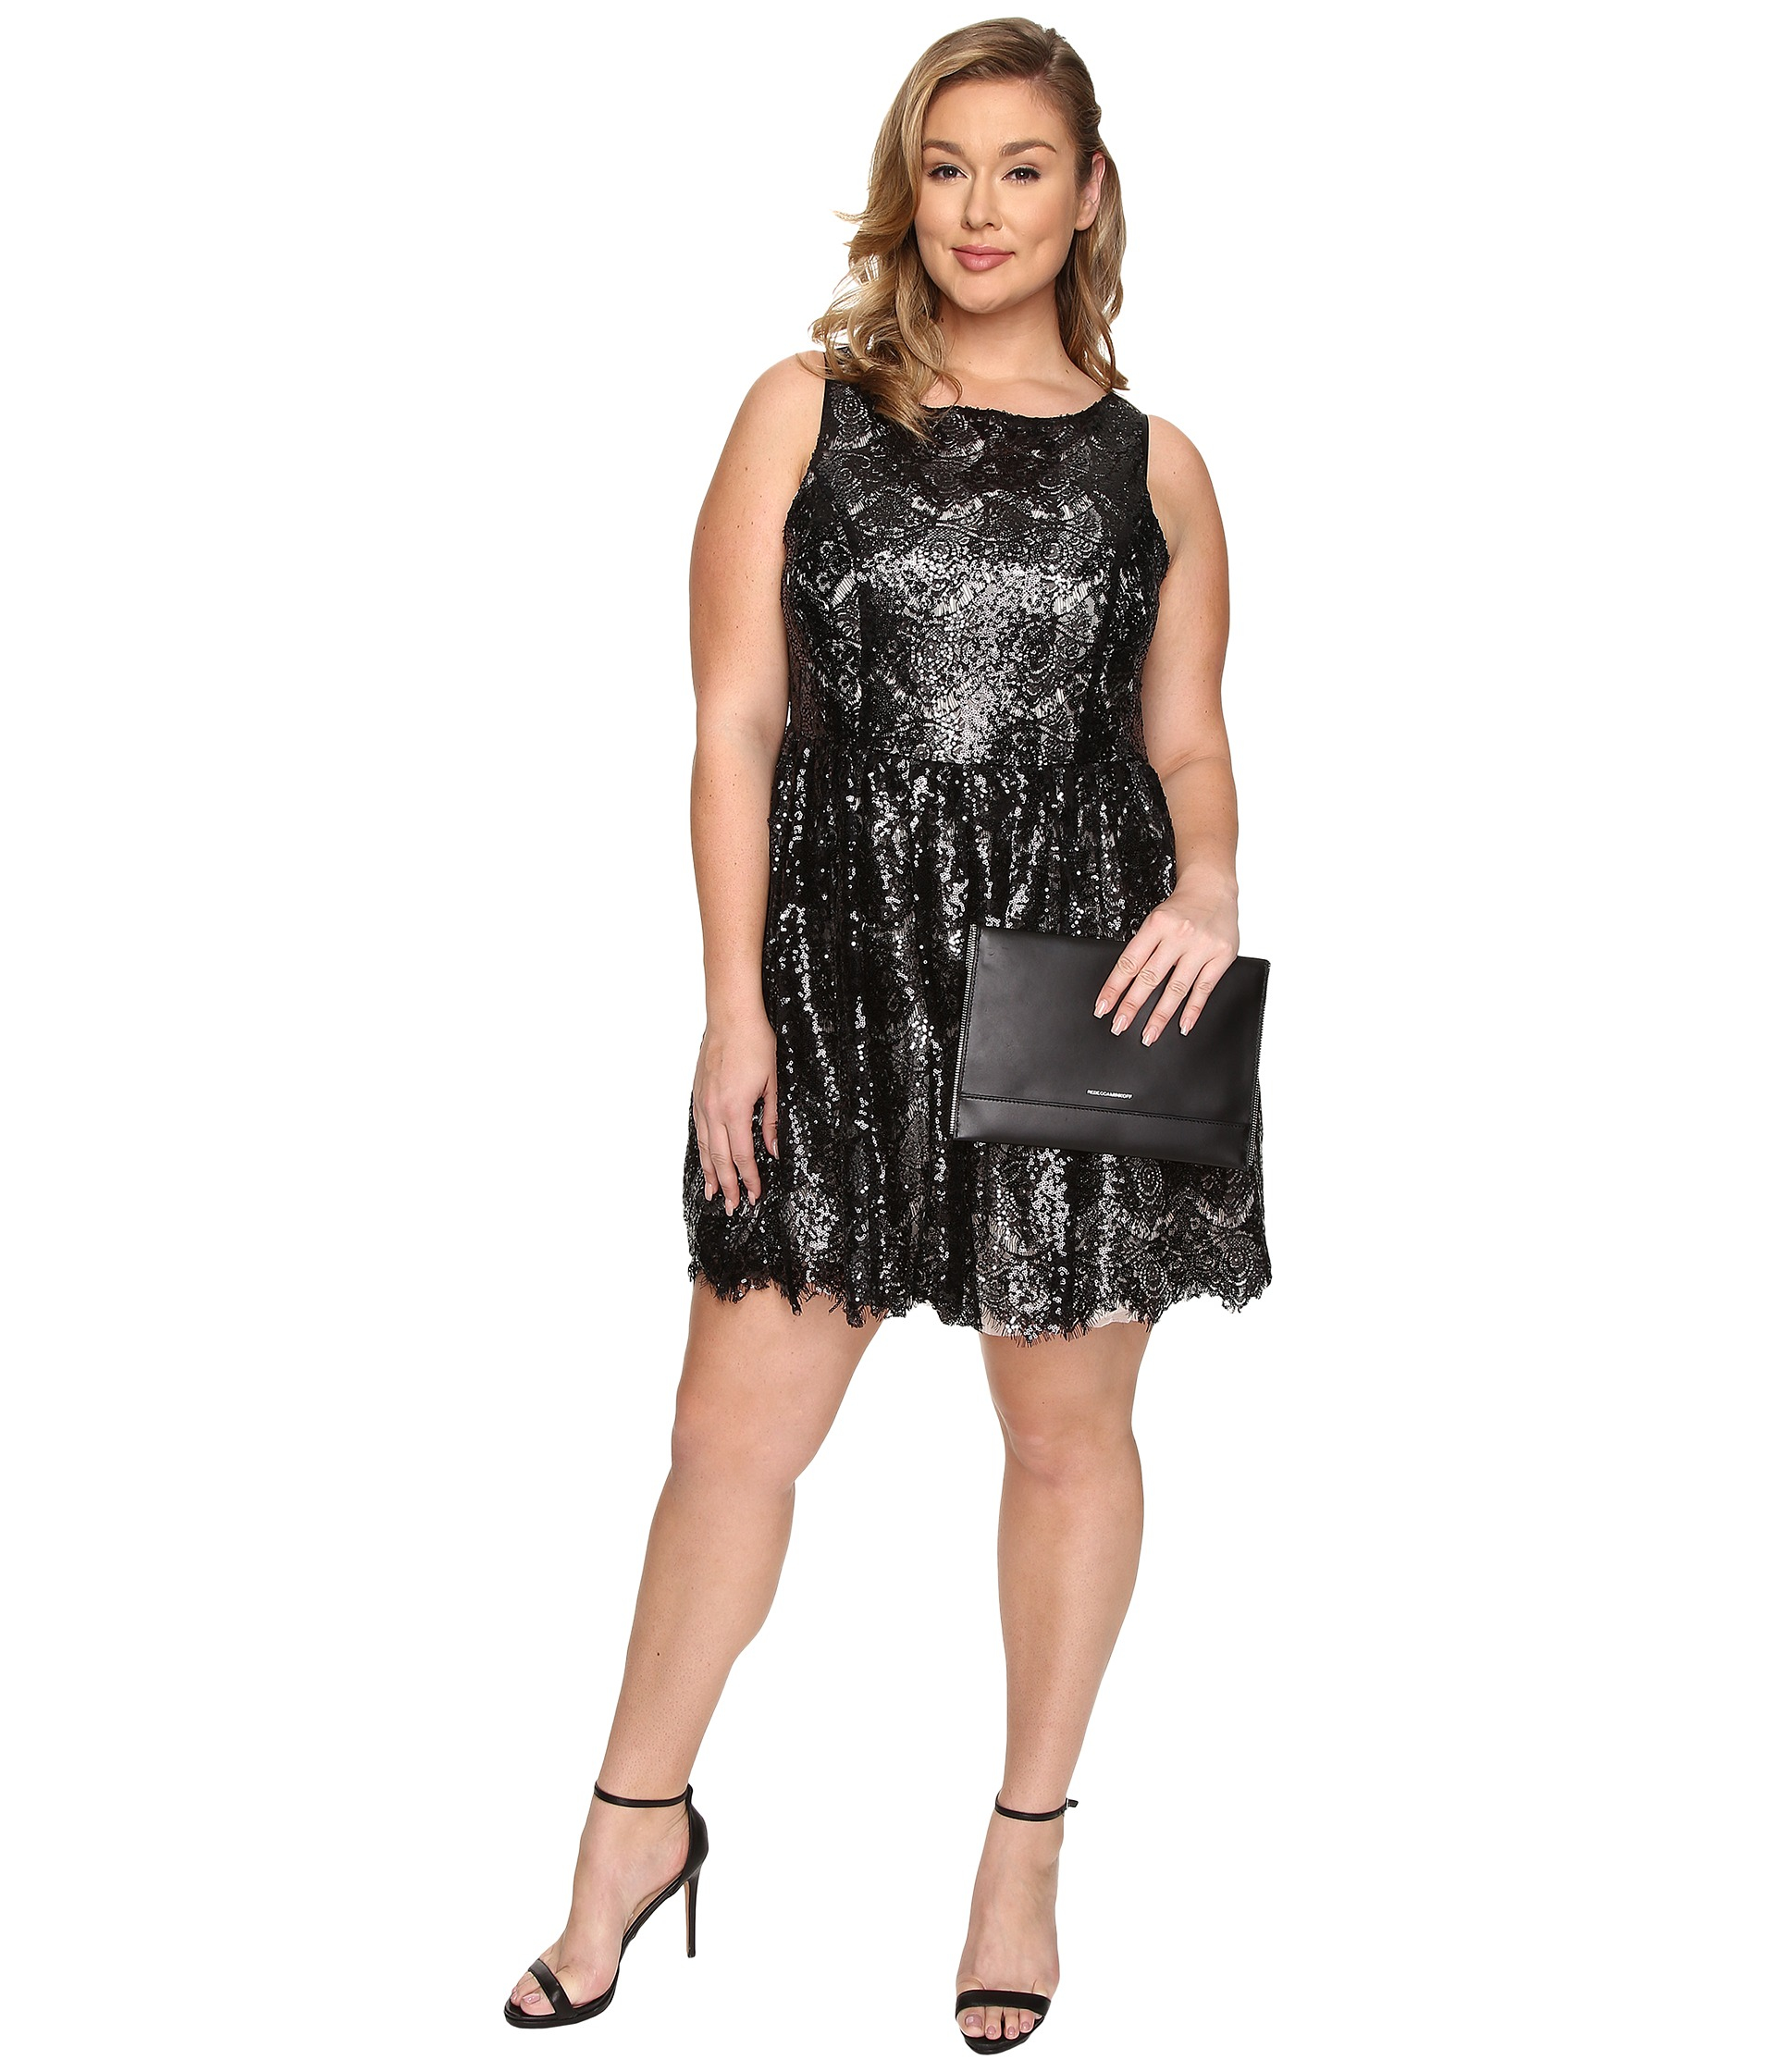 bb dakota plus size hart sequin lace dress in black | lyst